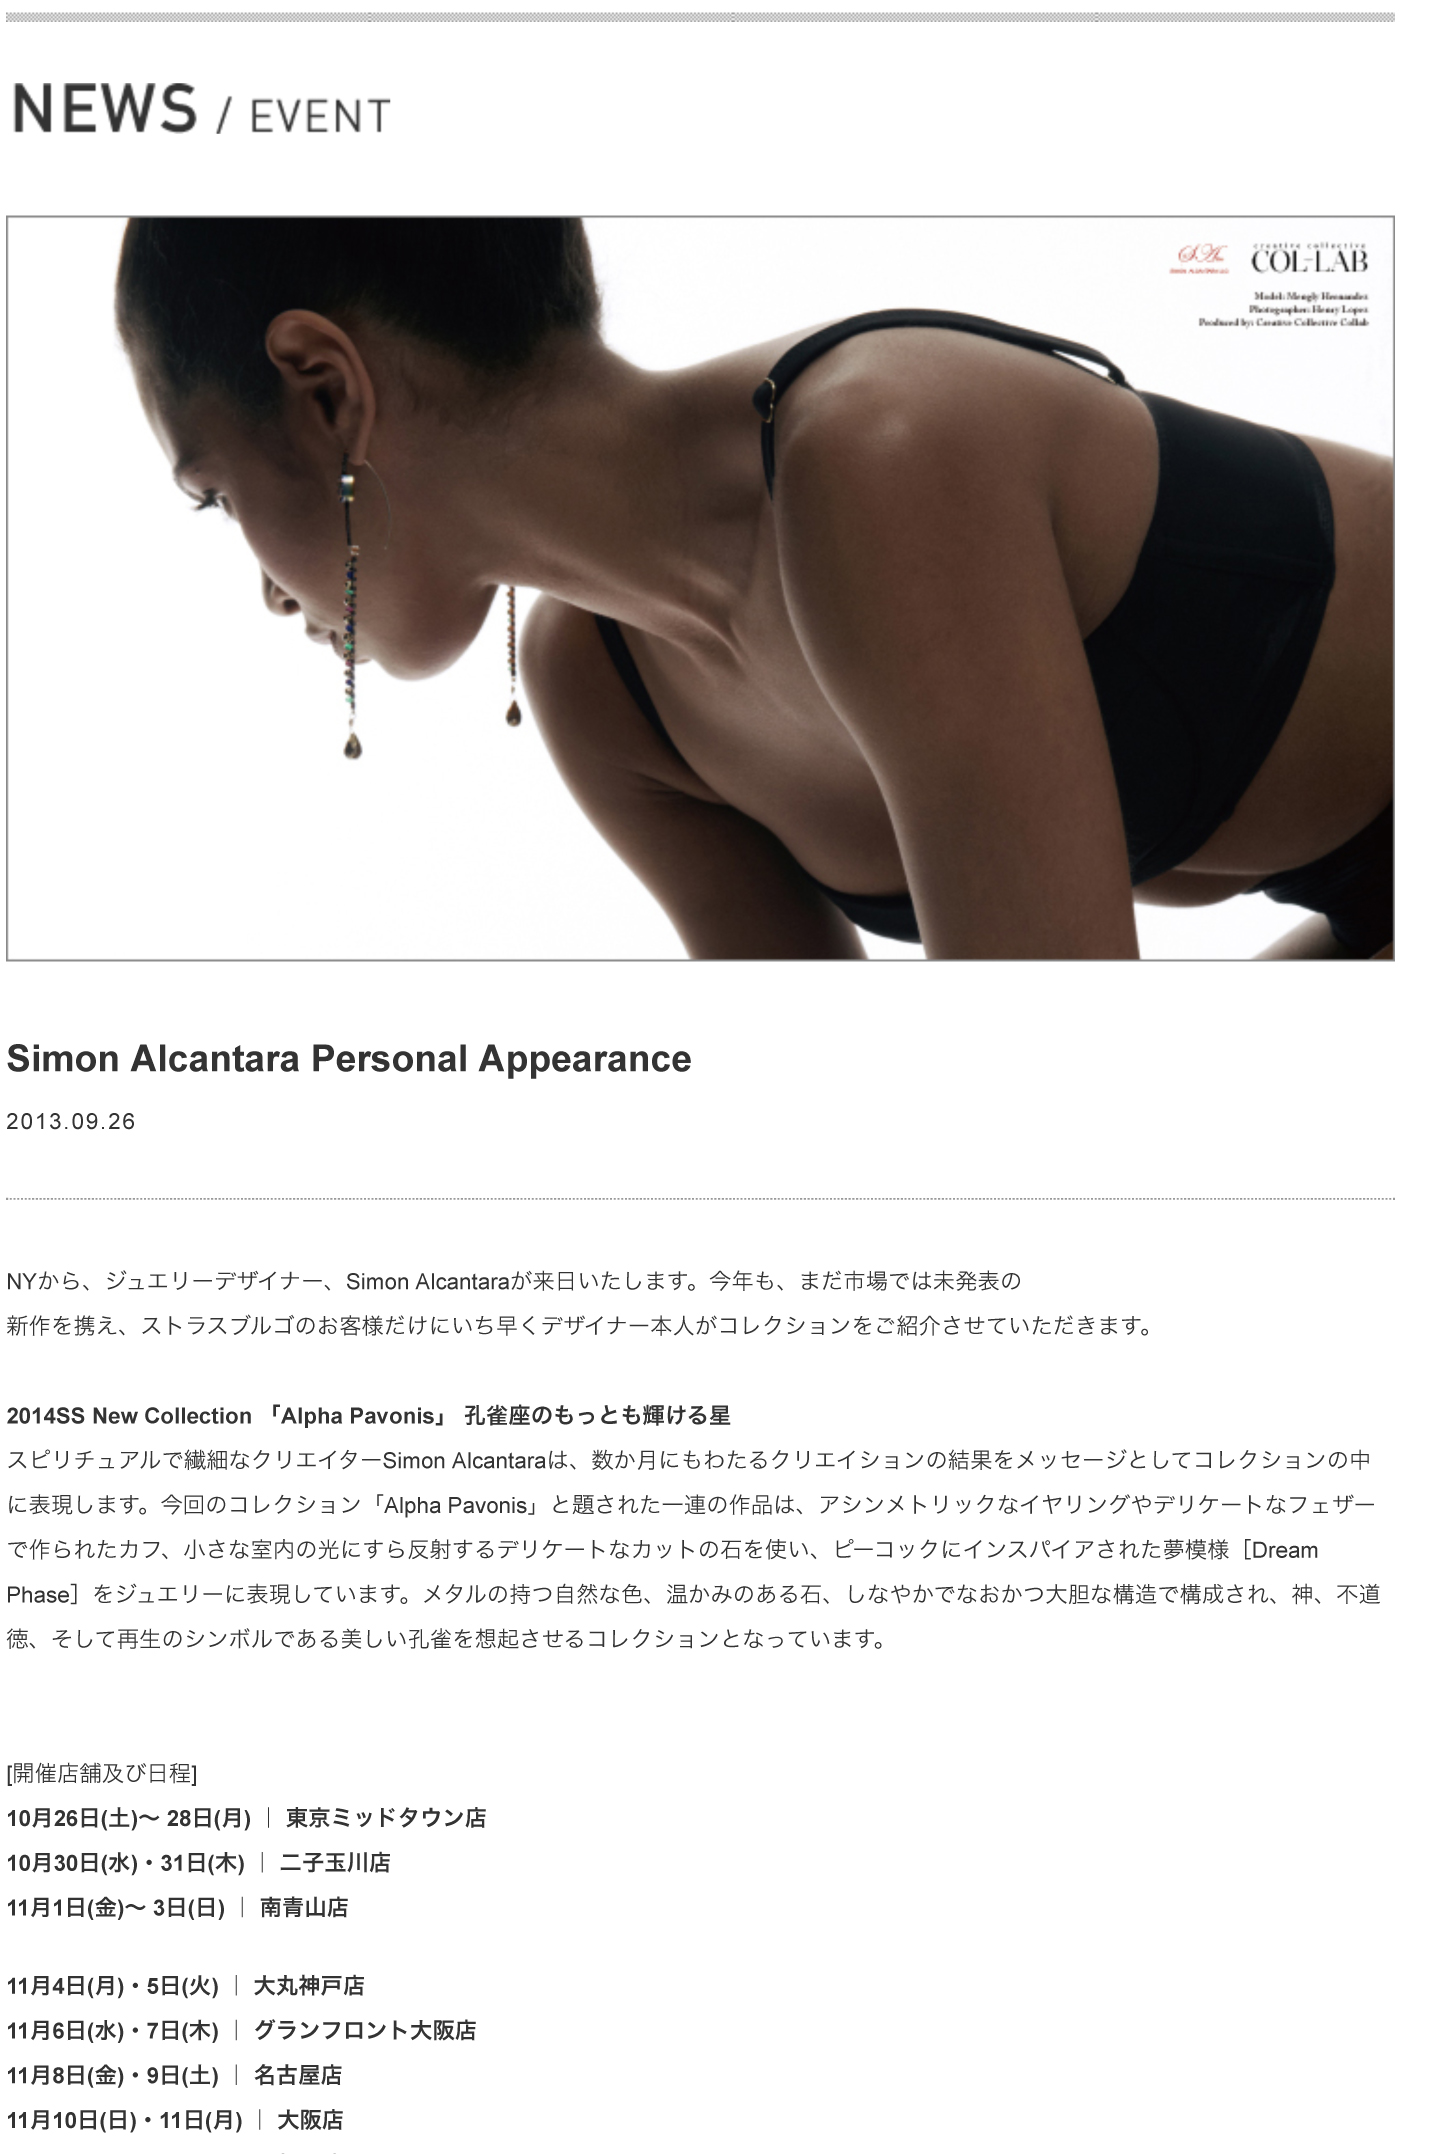 Simon Alcantara Personal Appearance - NEWS.jpg